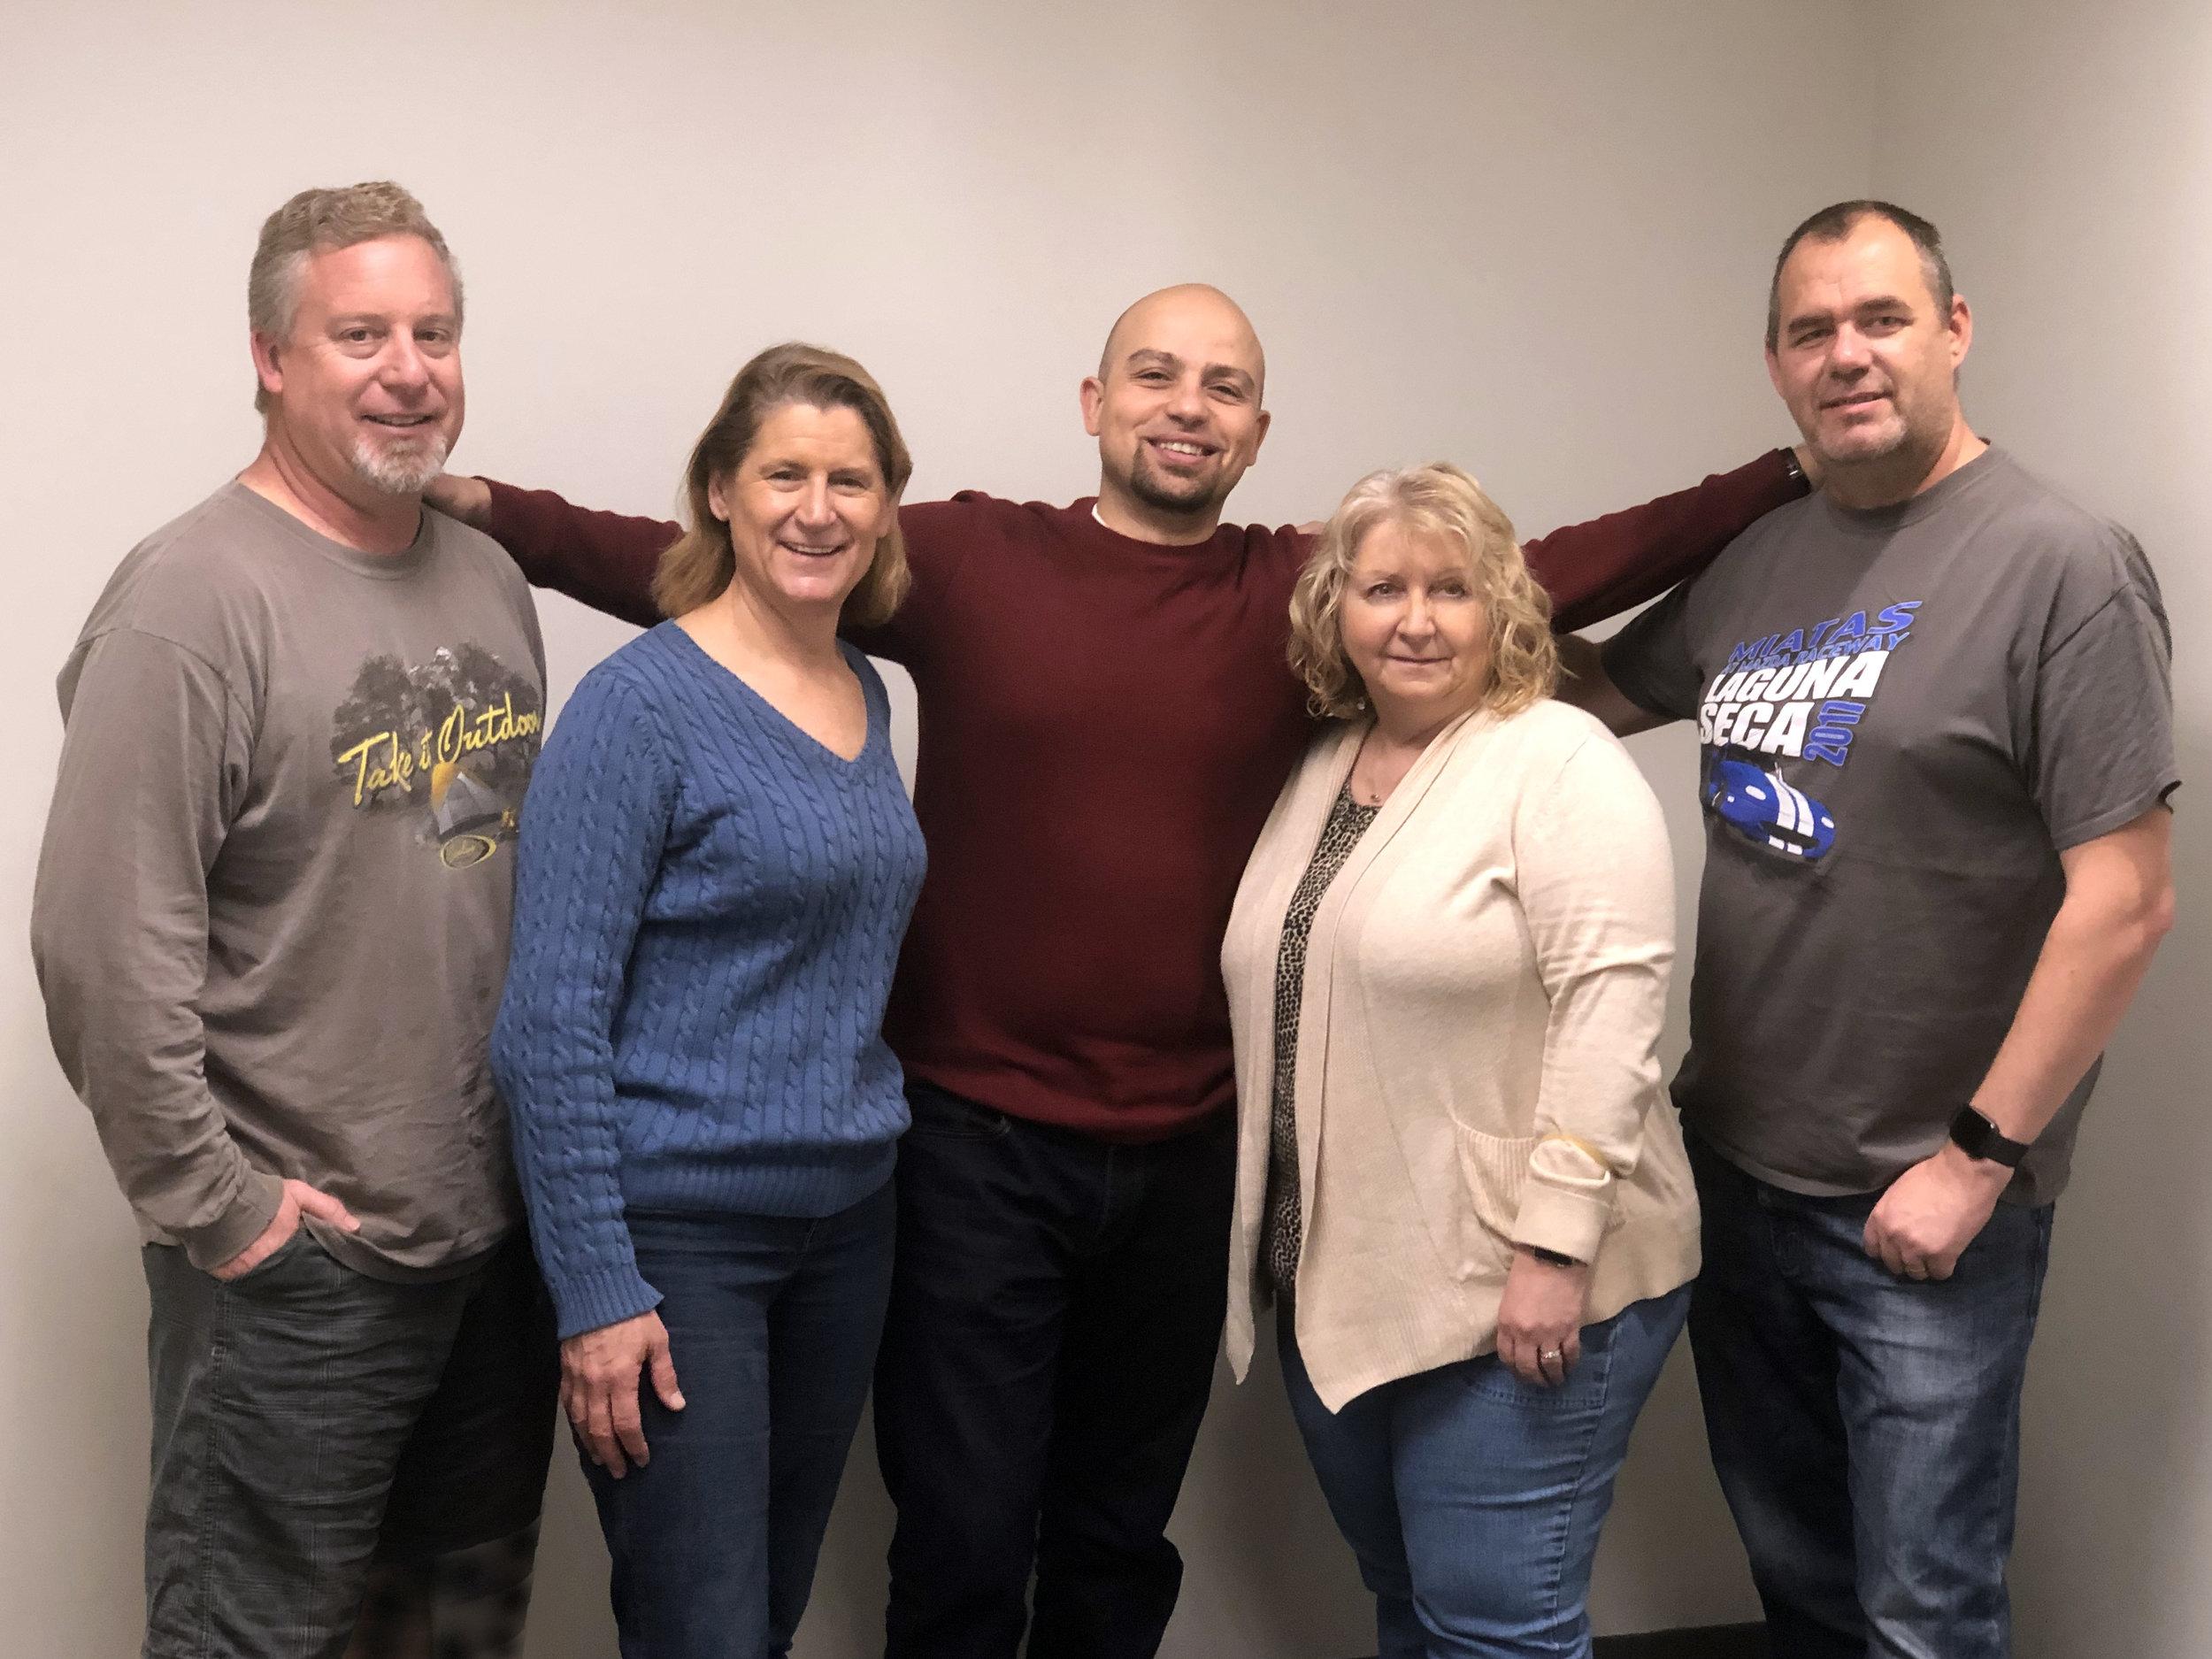 Left to right: Kirk, Paula, Gorkem, Susan, Gary